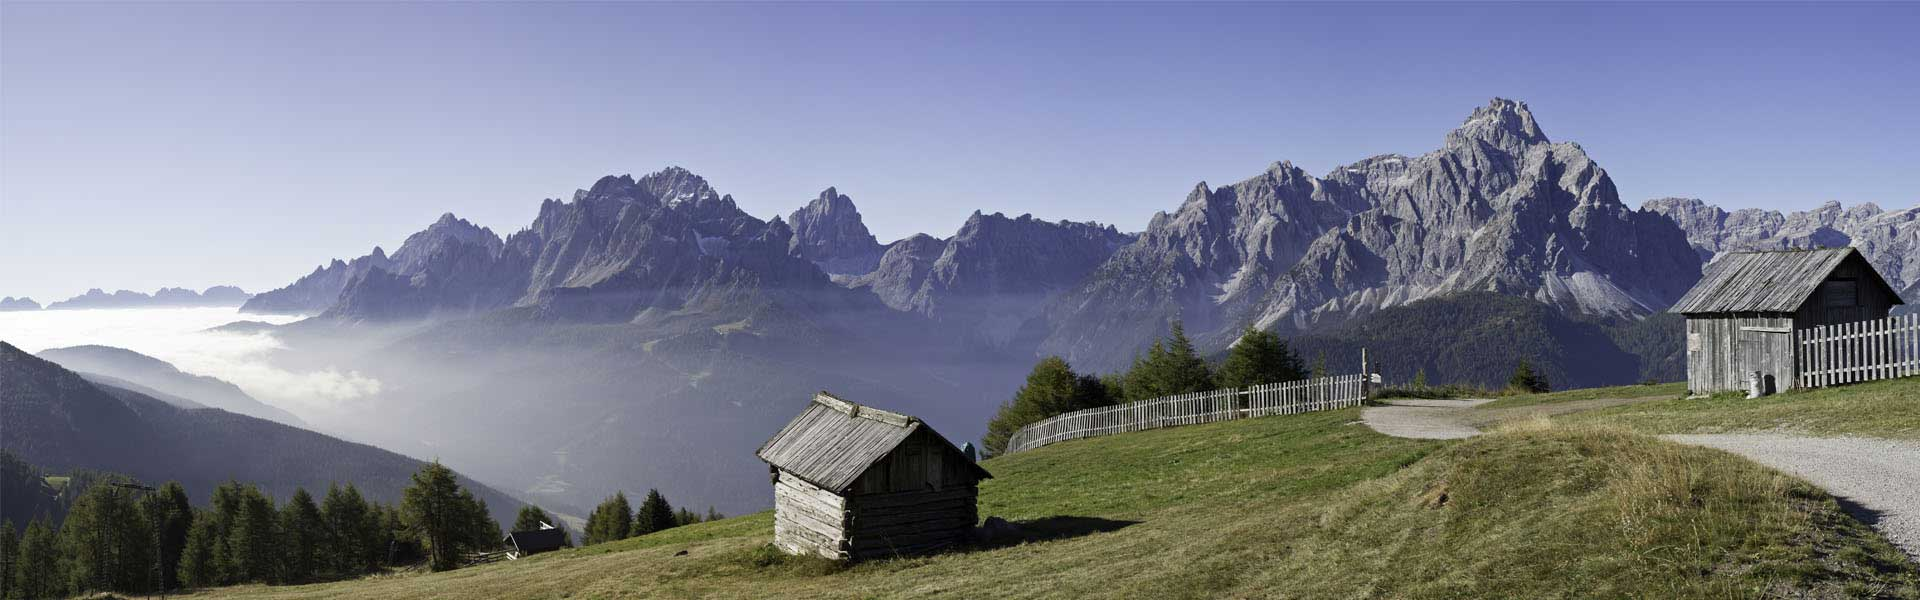 Zwei Hütten in den Bergen